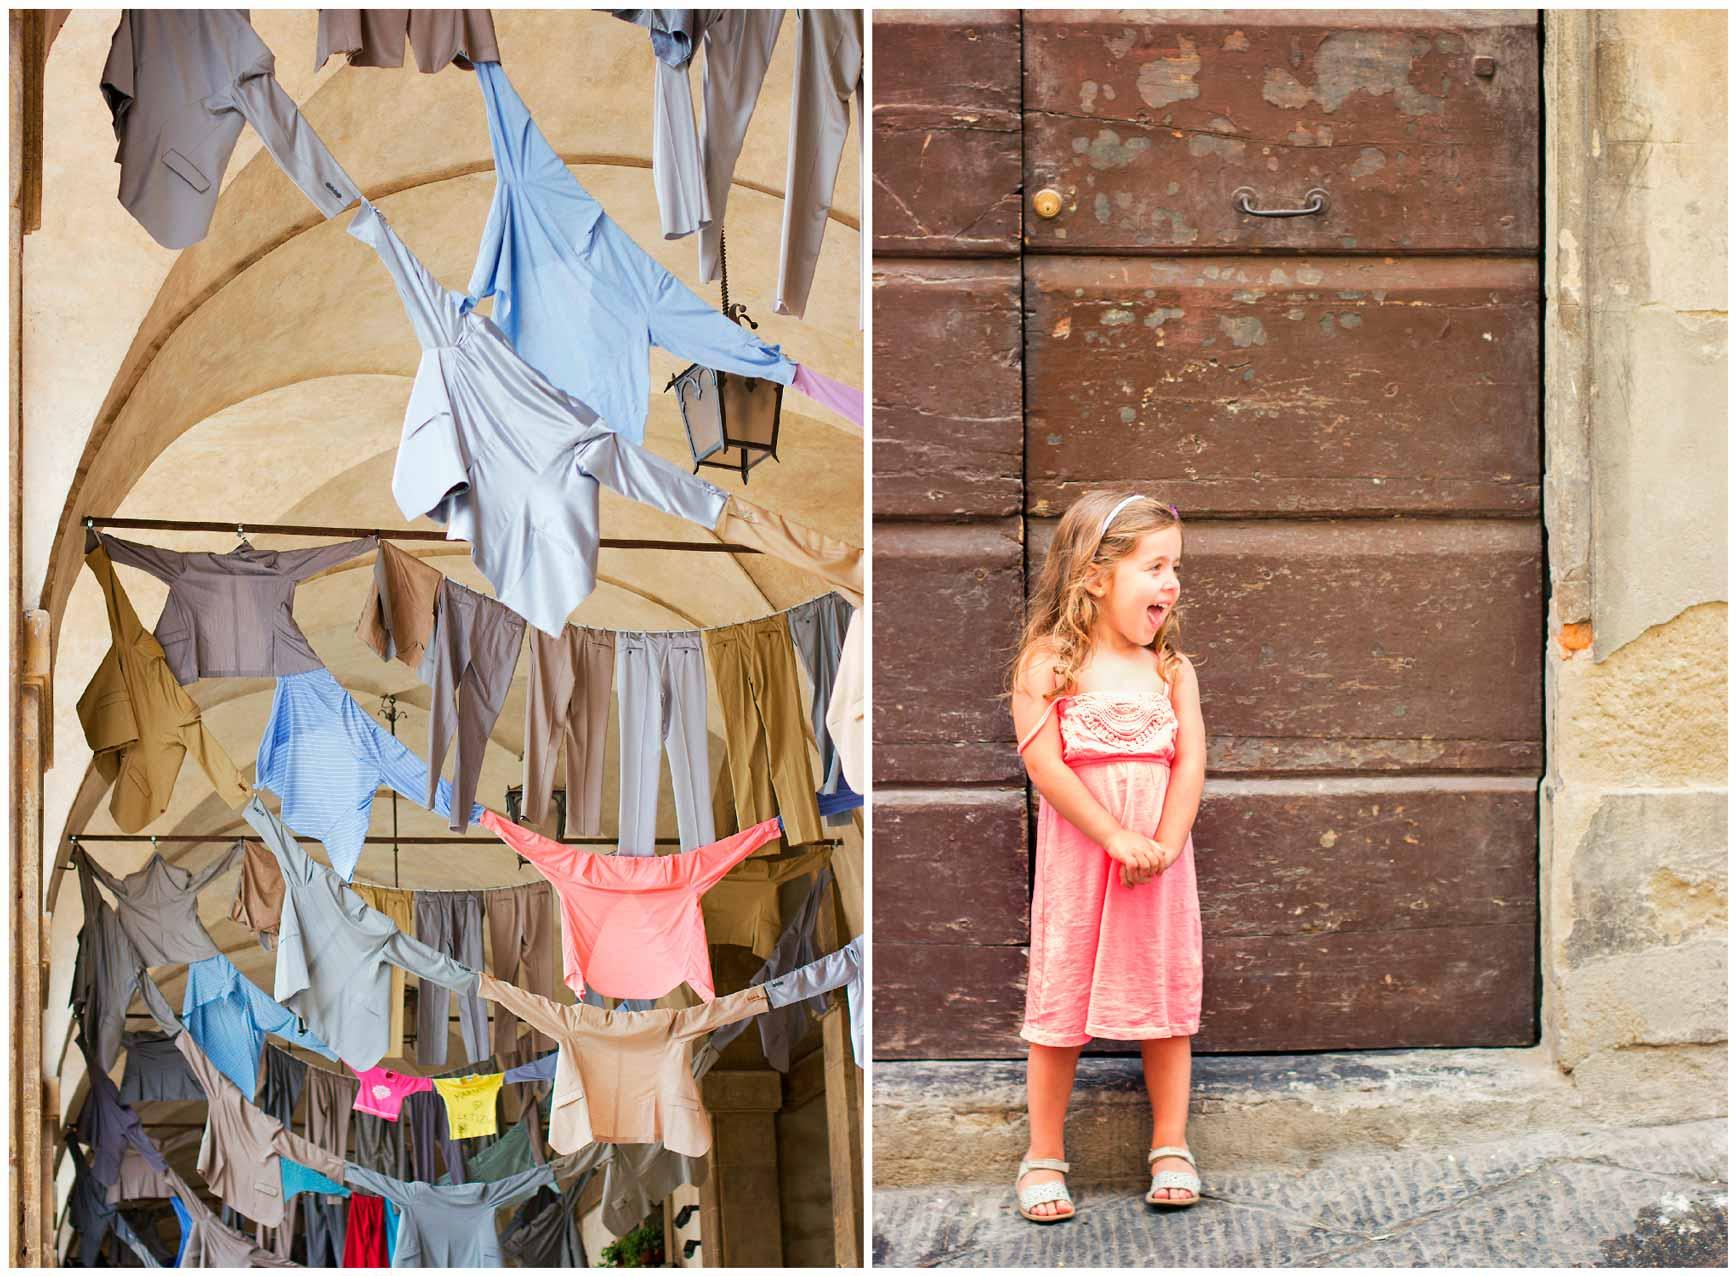 ToscanaclaraBmartin_14